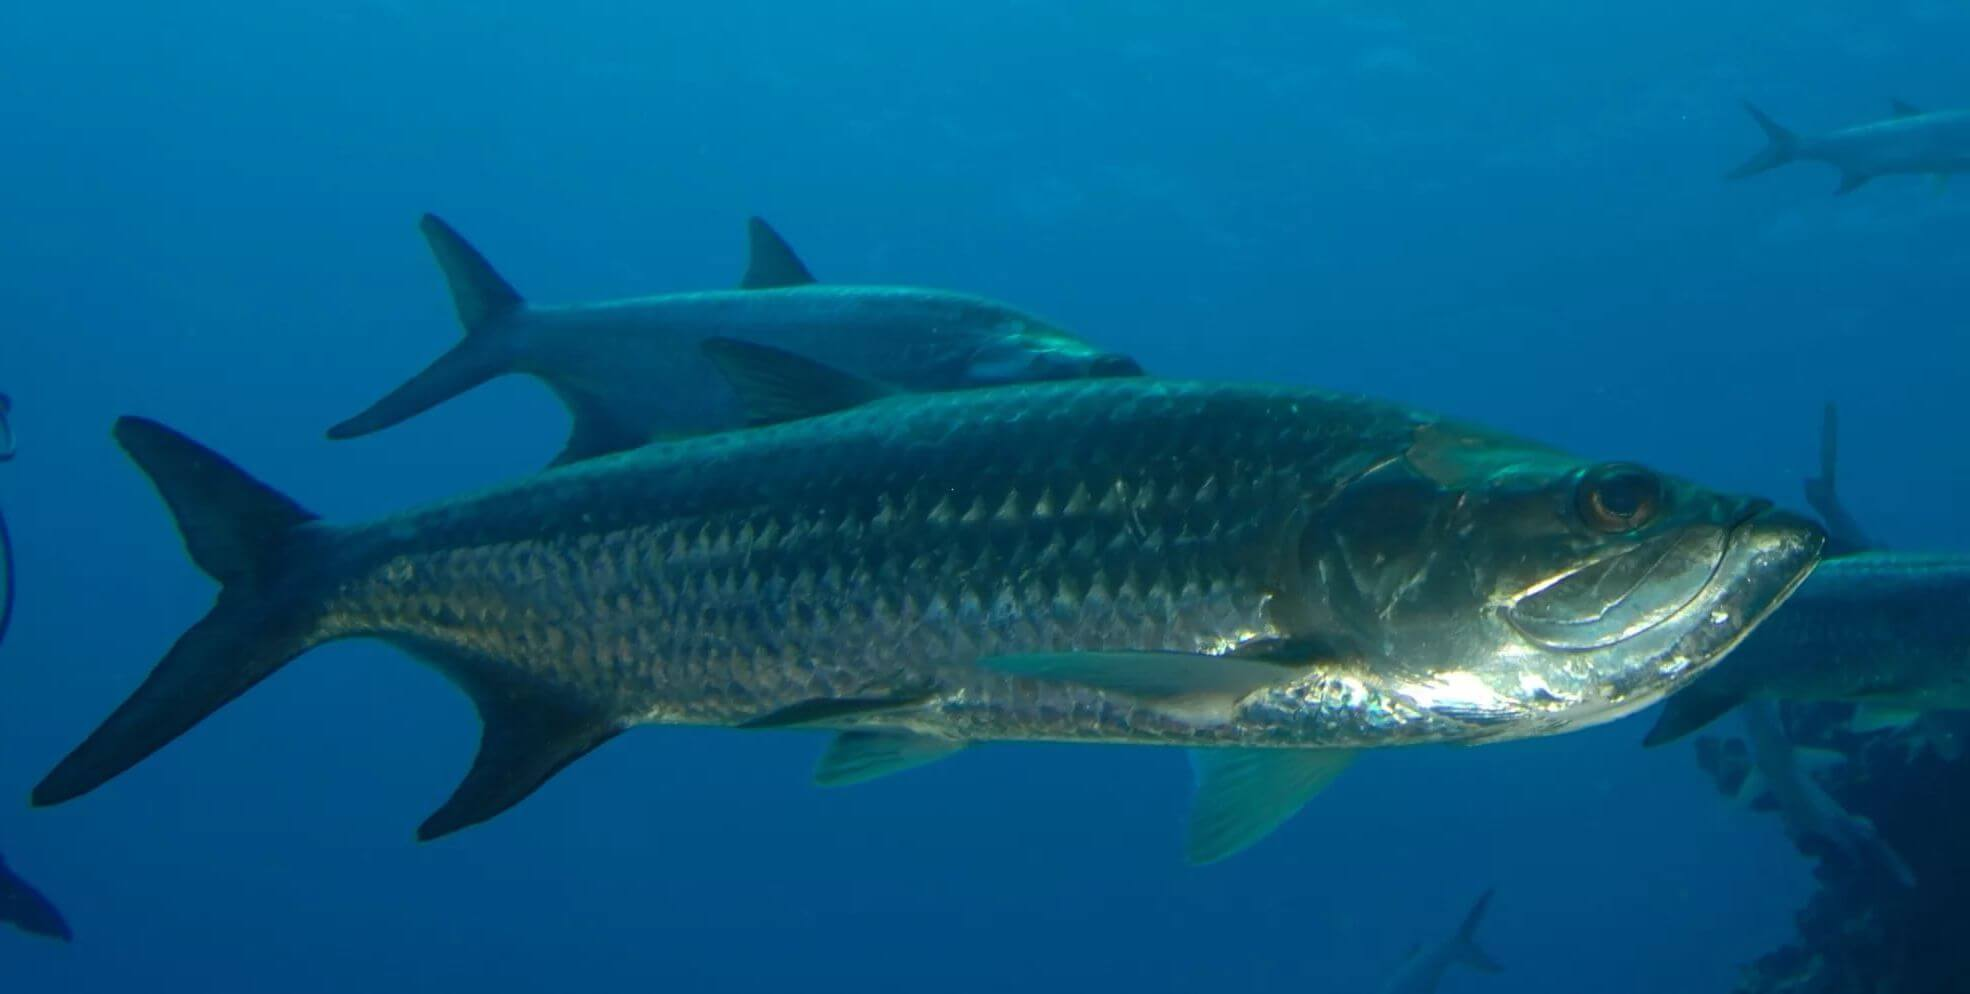 Tarpon, Everglades wildlife, Private airboat tours, Everglades fishing